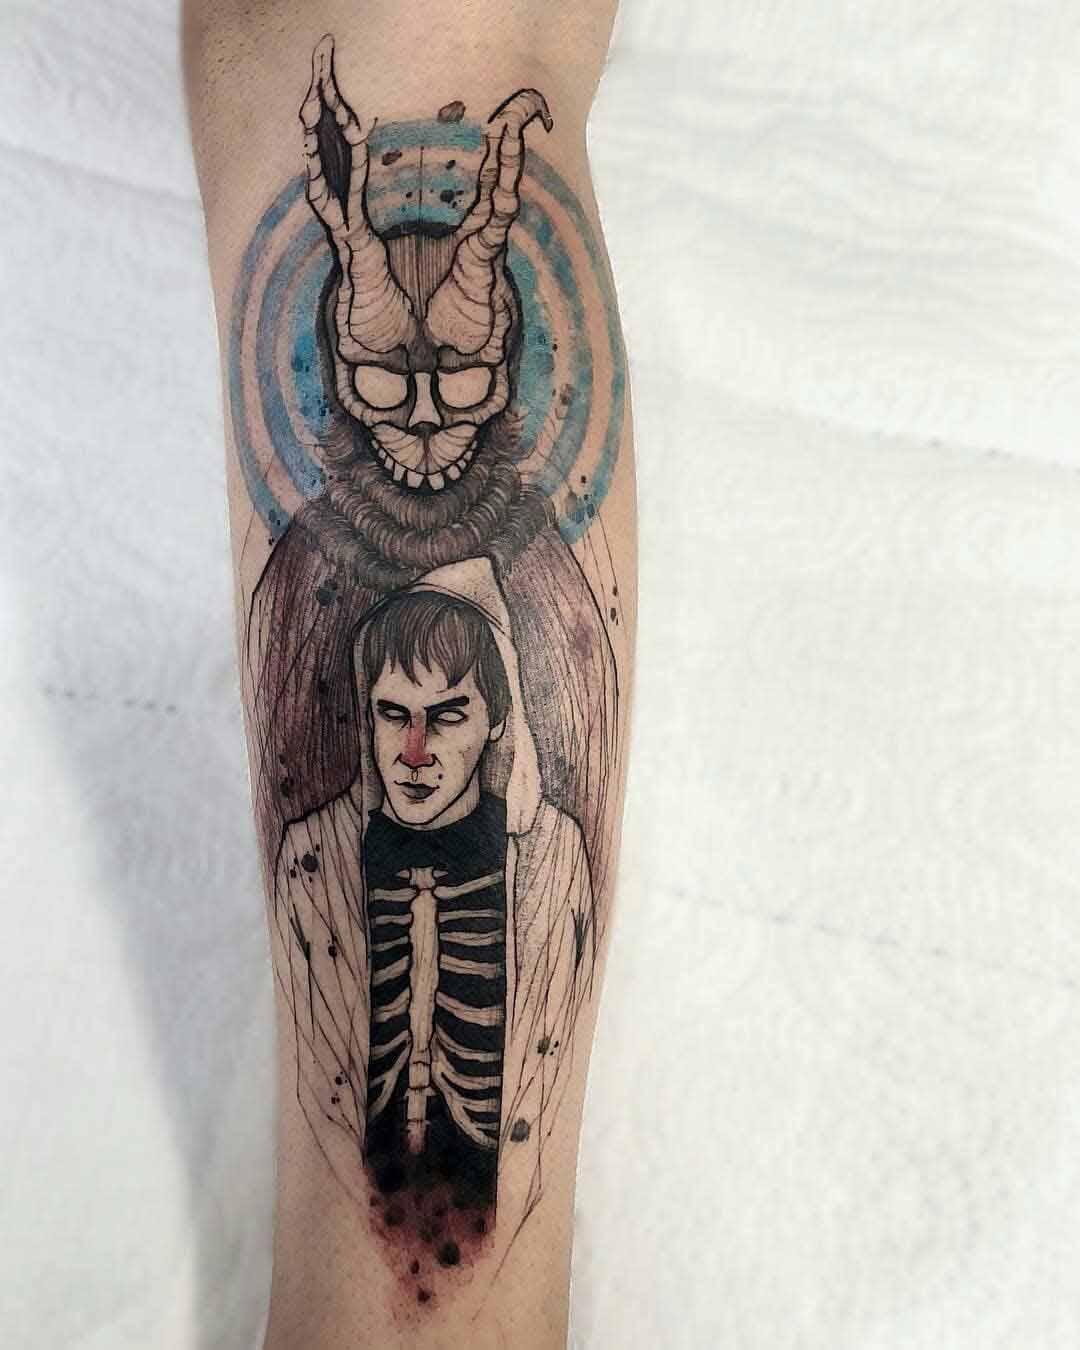 followed by demon tattoo